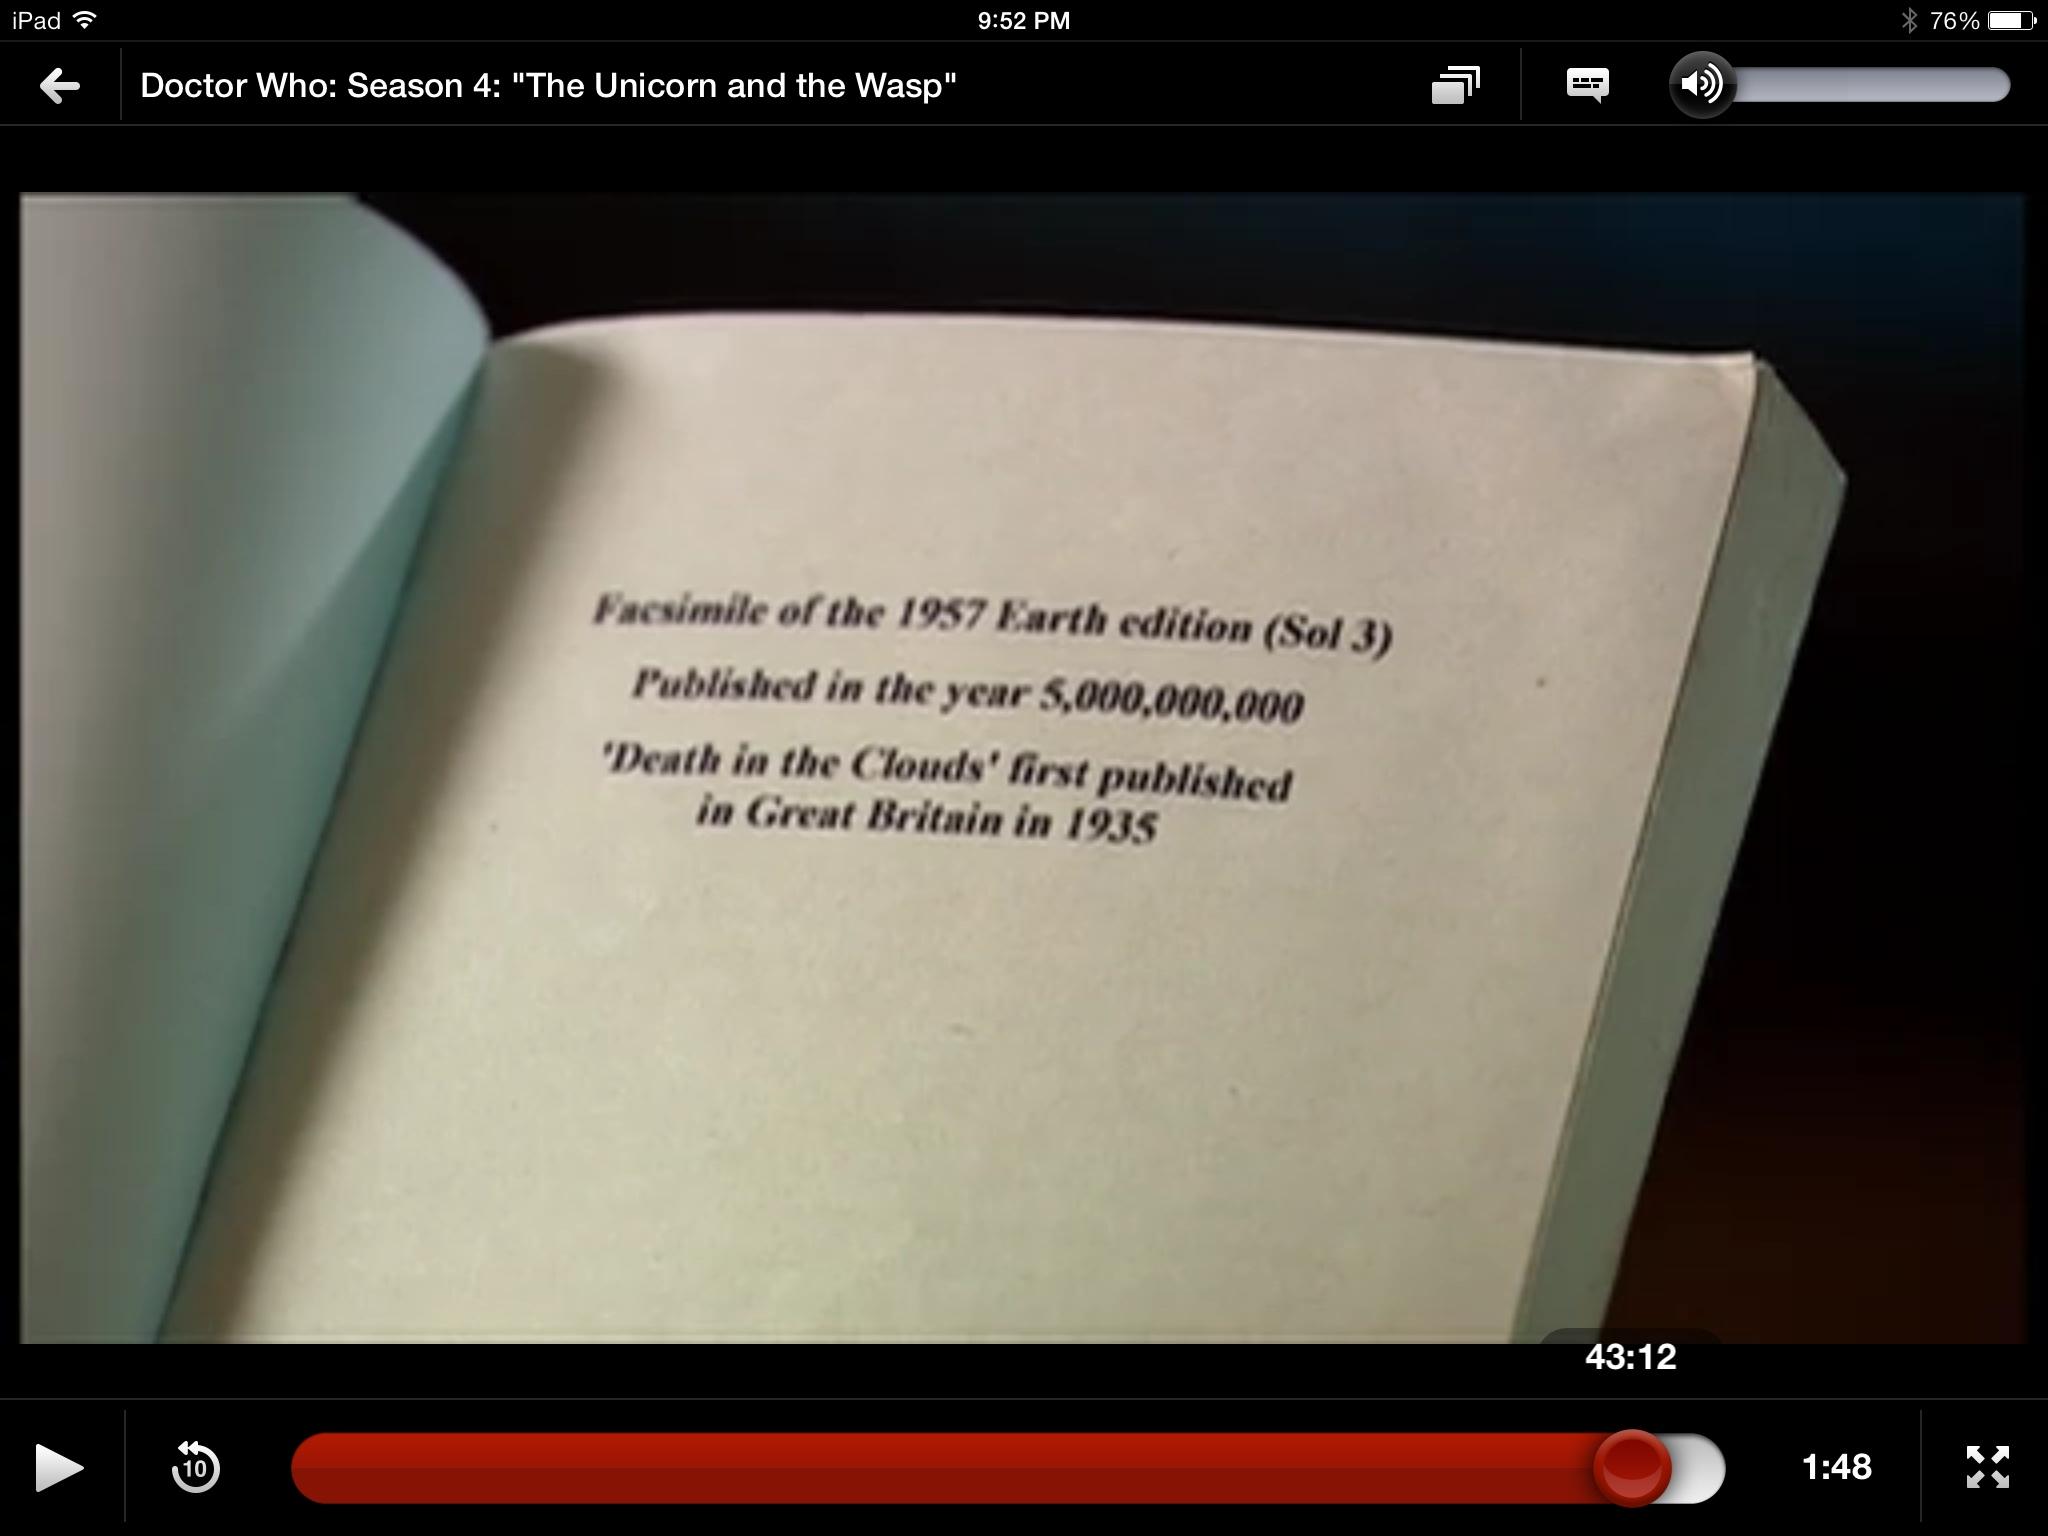 Doctor Who Is Very Bullish on Paperbacks!